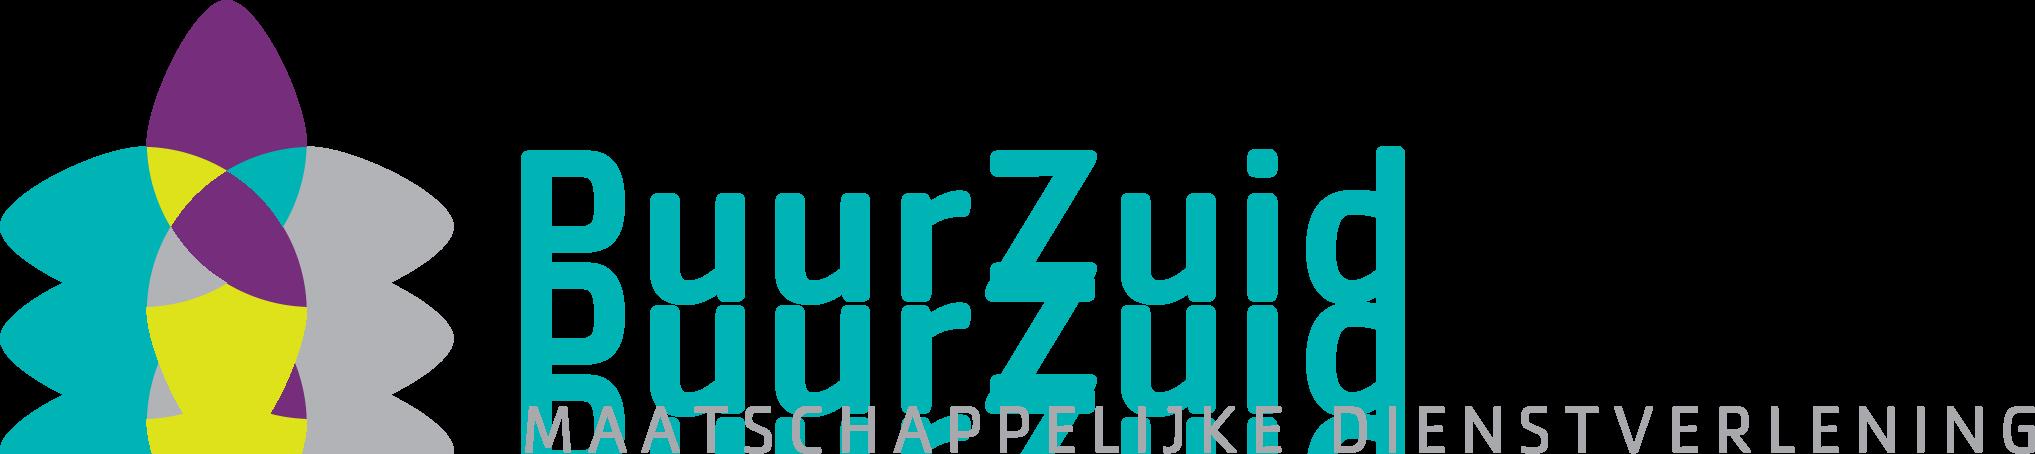 logo PuurZuid compleet